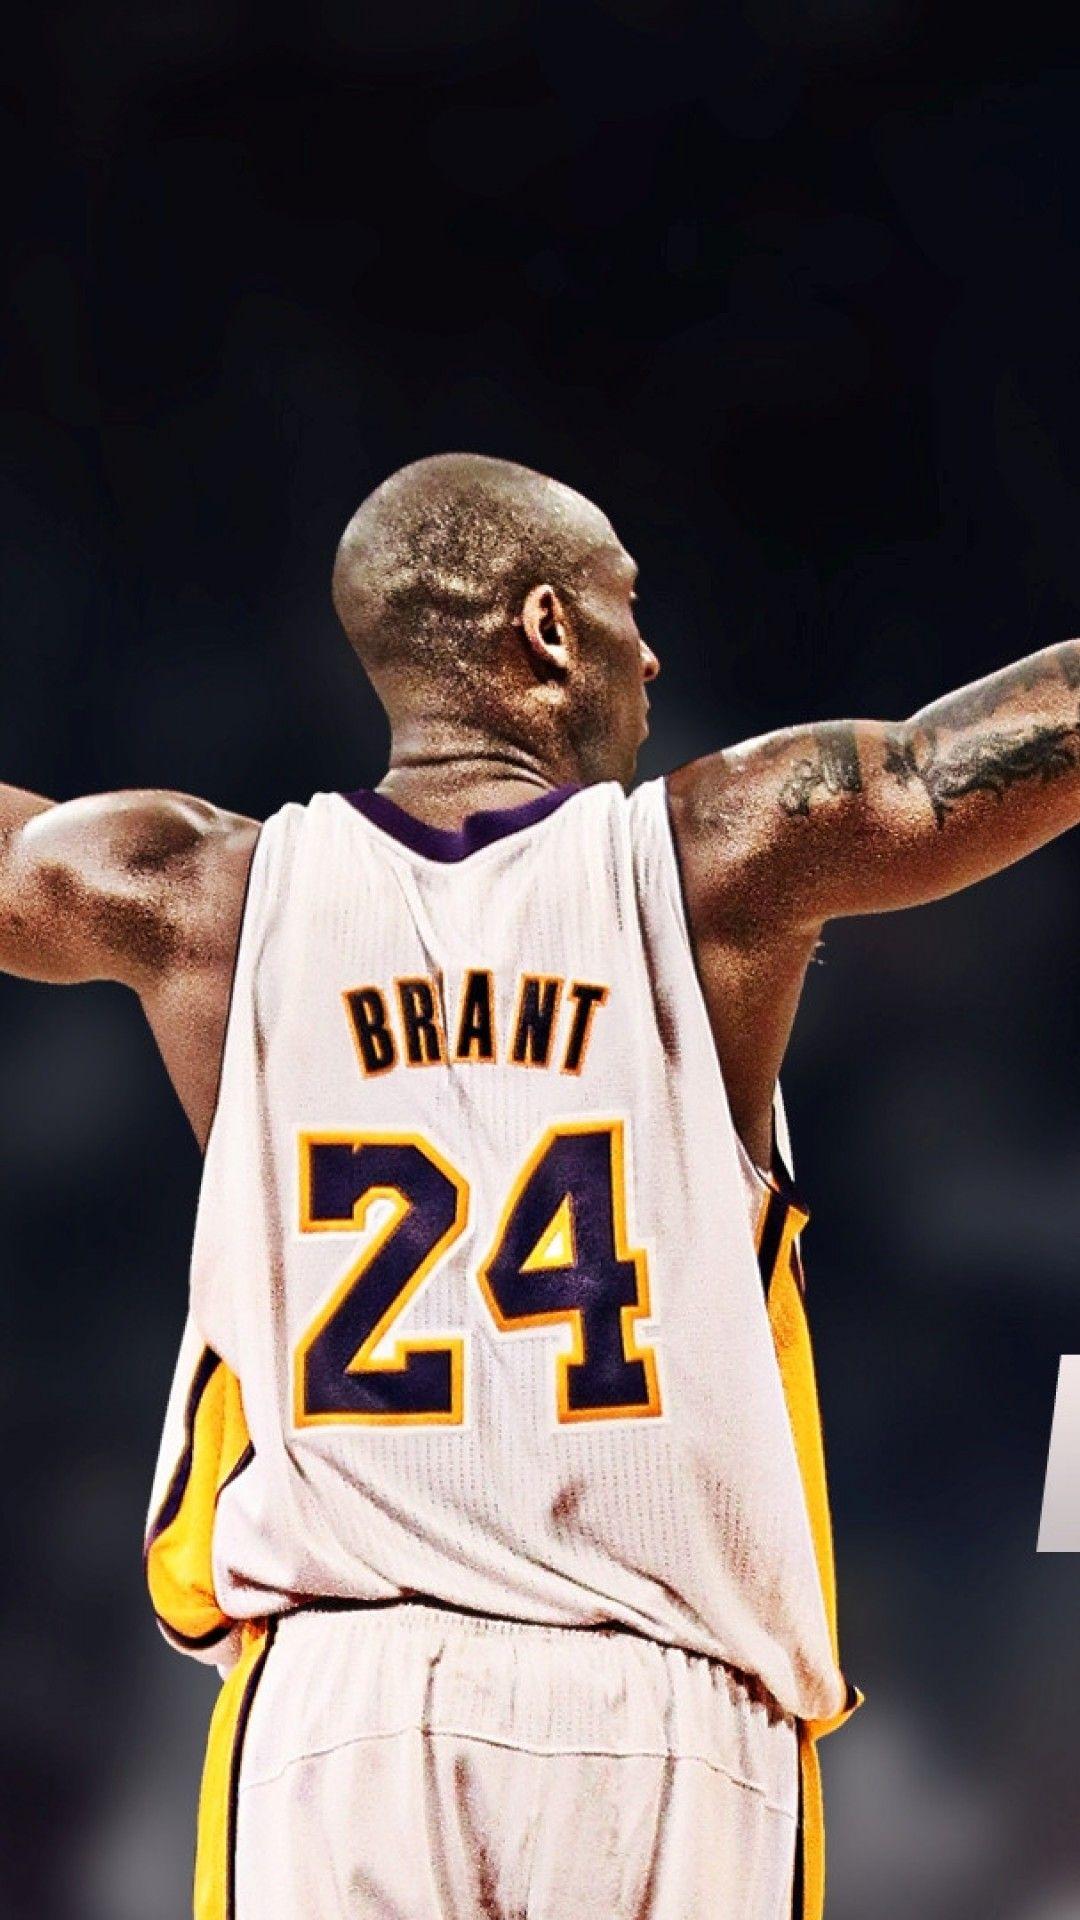 Kobe Bryant Background in 2020 (With images) Kobe bryant